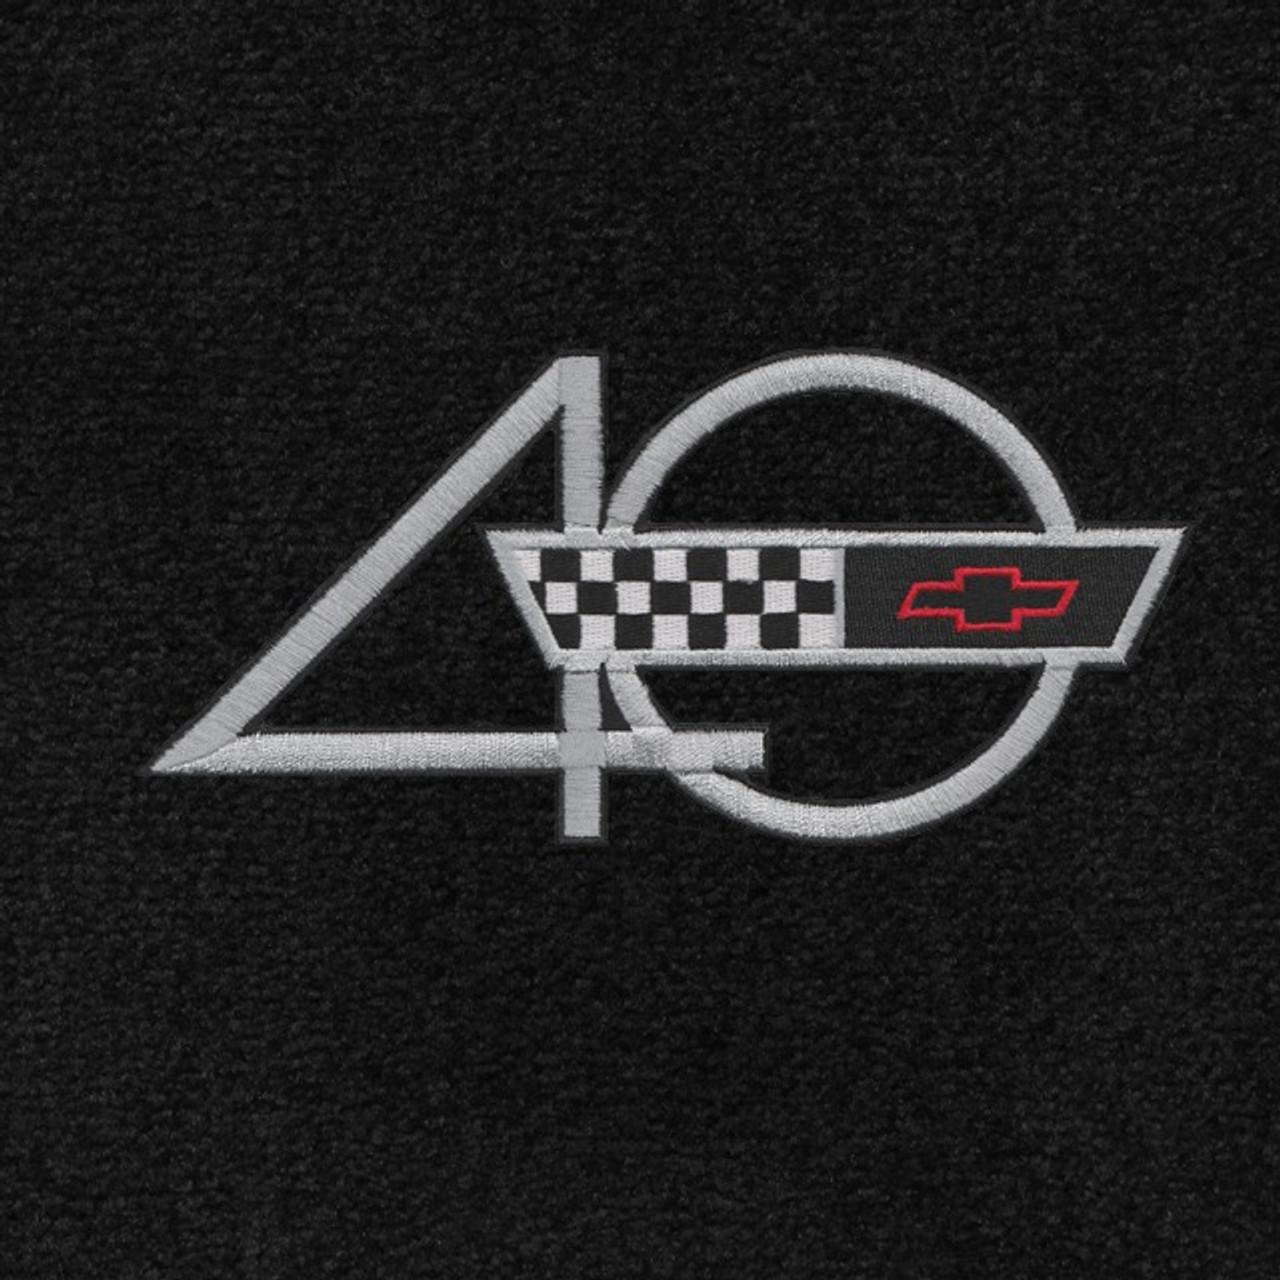 C4 Corvette 40th Anniversary Logo (93)